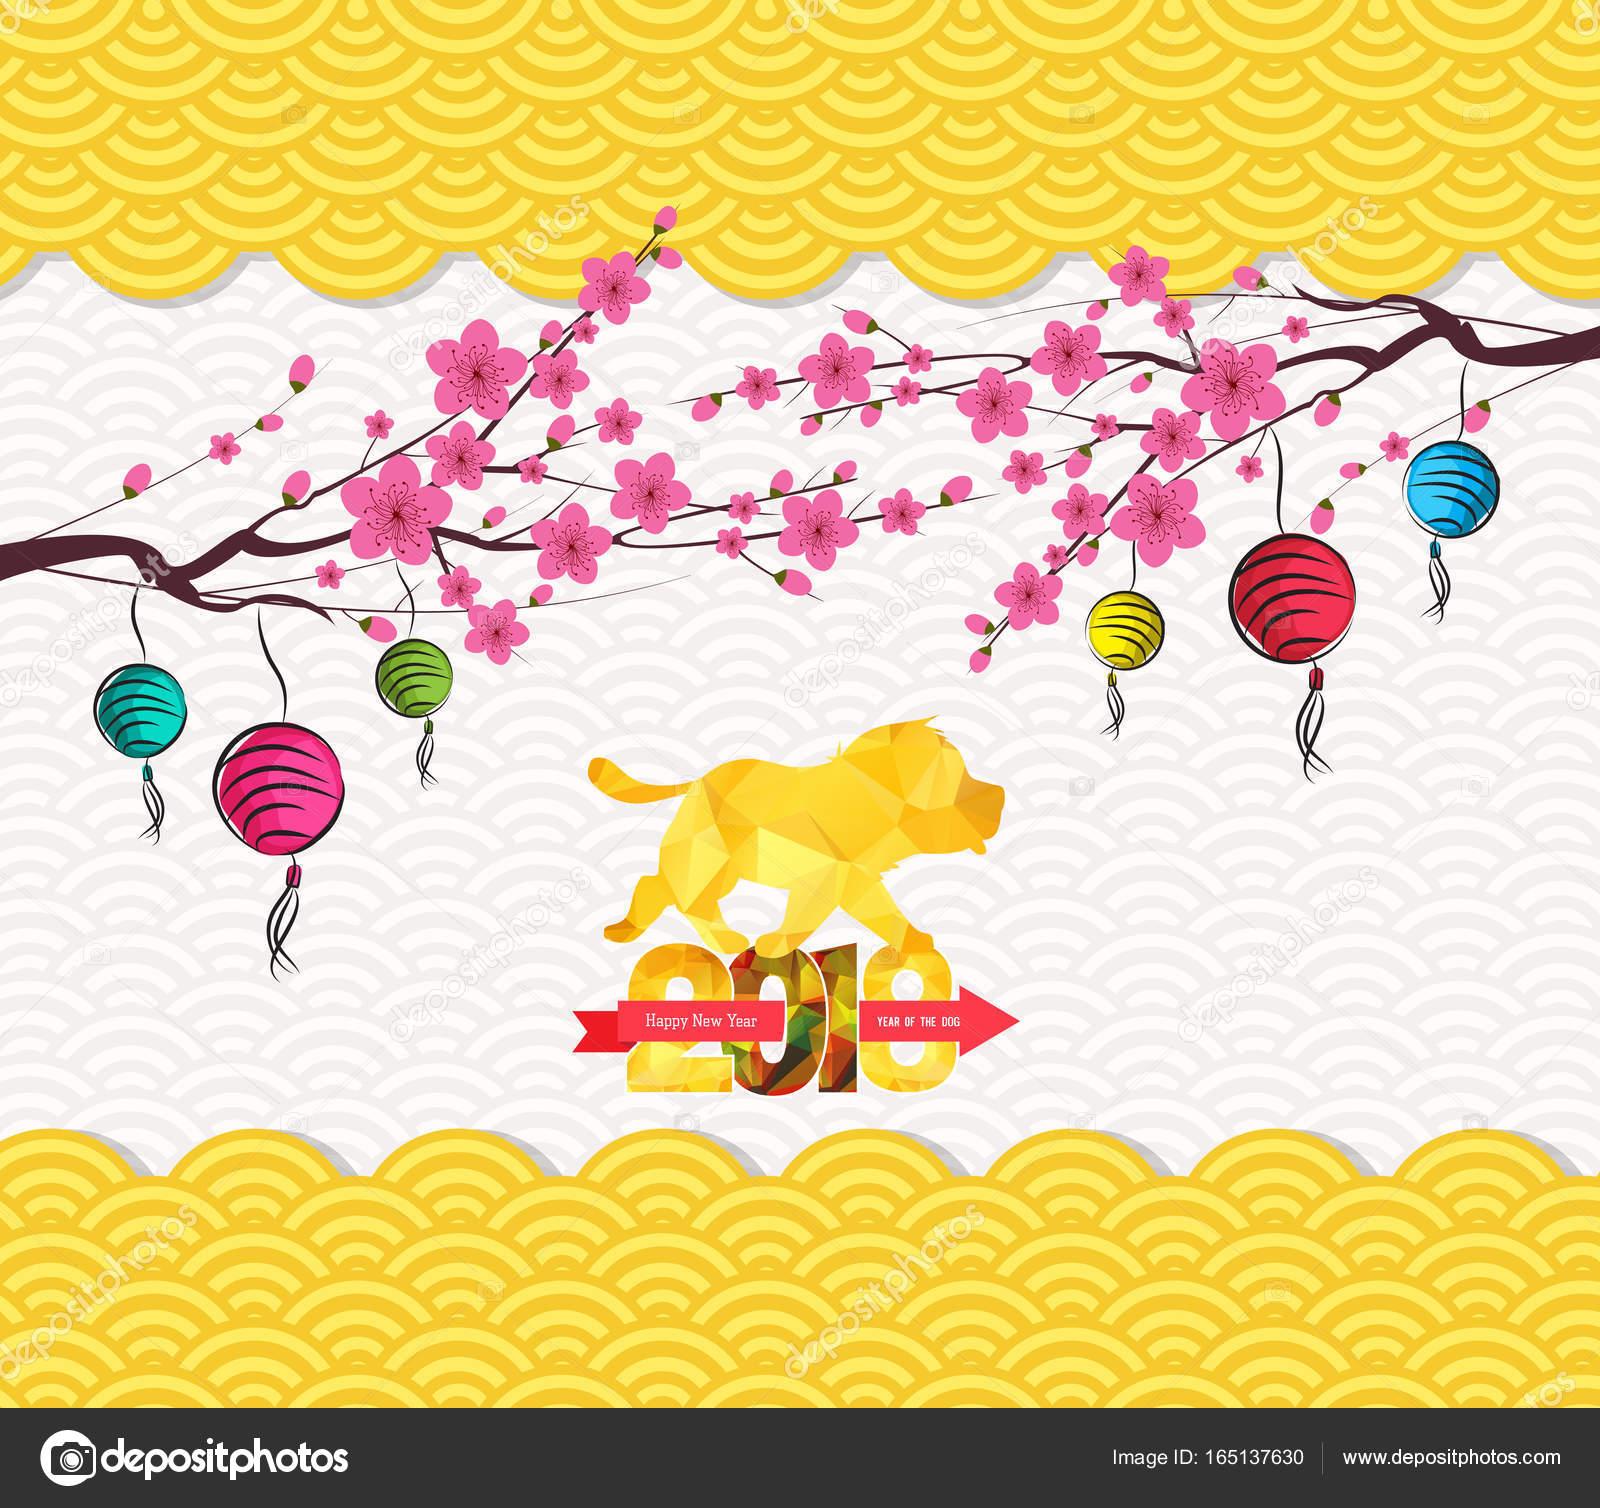 happy chinese new year 2018 seasons greetings lantern design year of the dog